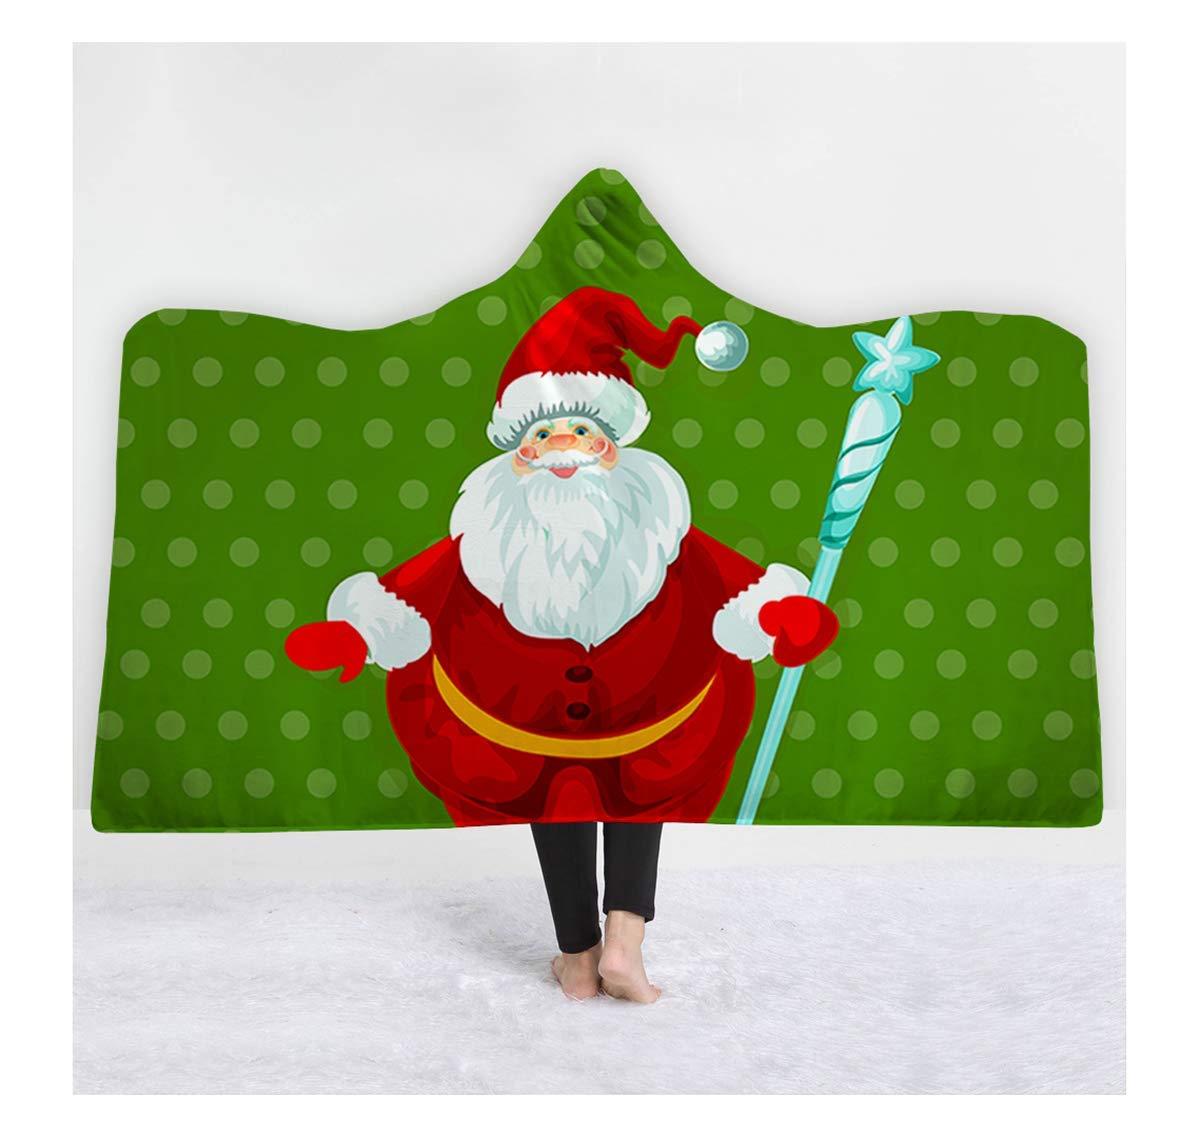 MOXHH 厚手 暖かいフード付きブランケット 厚手 3Dデジタルプリント クリスマスブランケット Adult Adult Adult 29 B07K8NS59R B07K8NS59R, BOON SQUARE -陽気な広場-:124ced70 --- ijpba.info